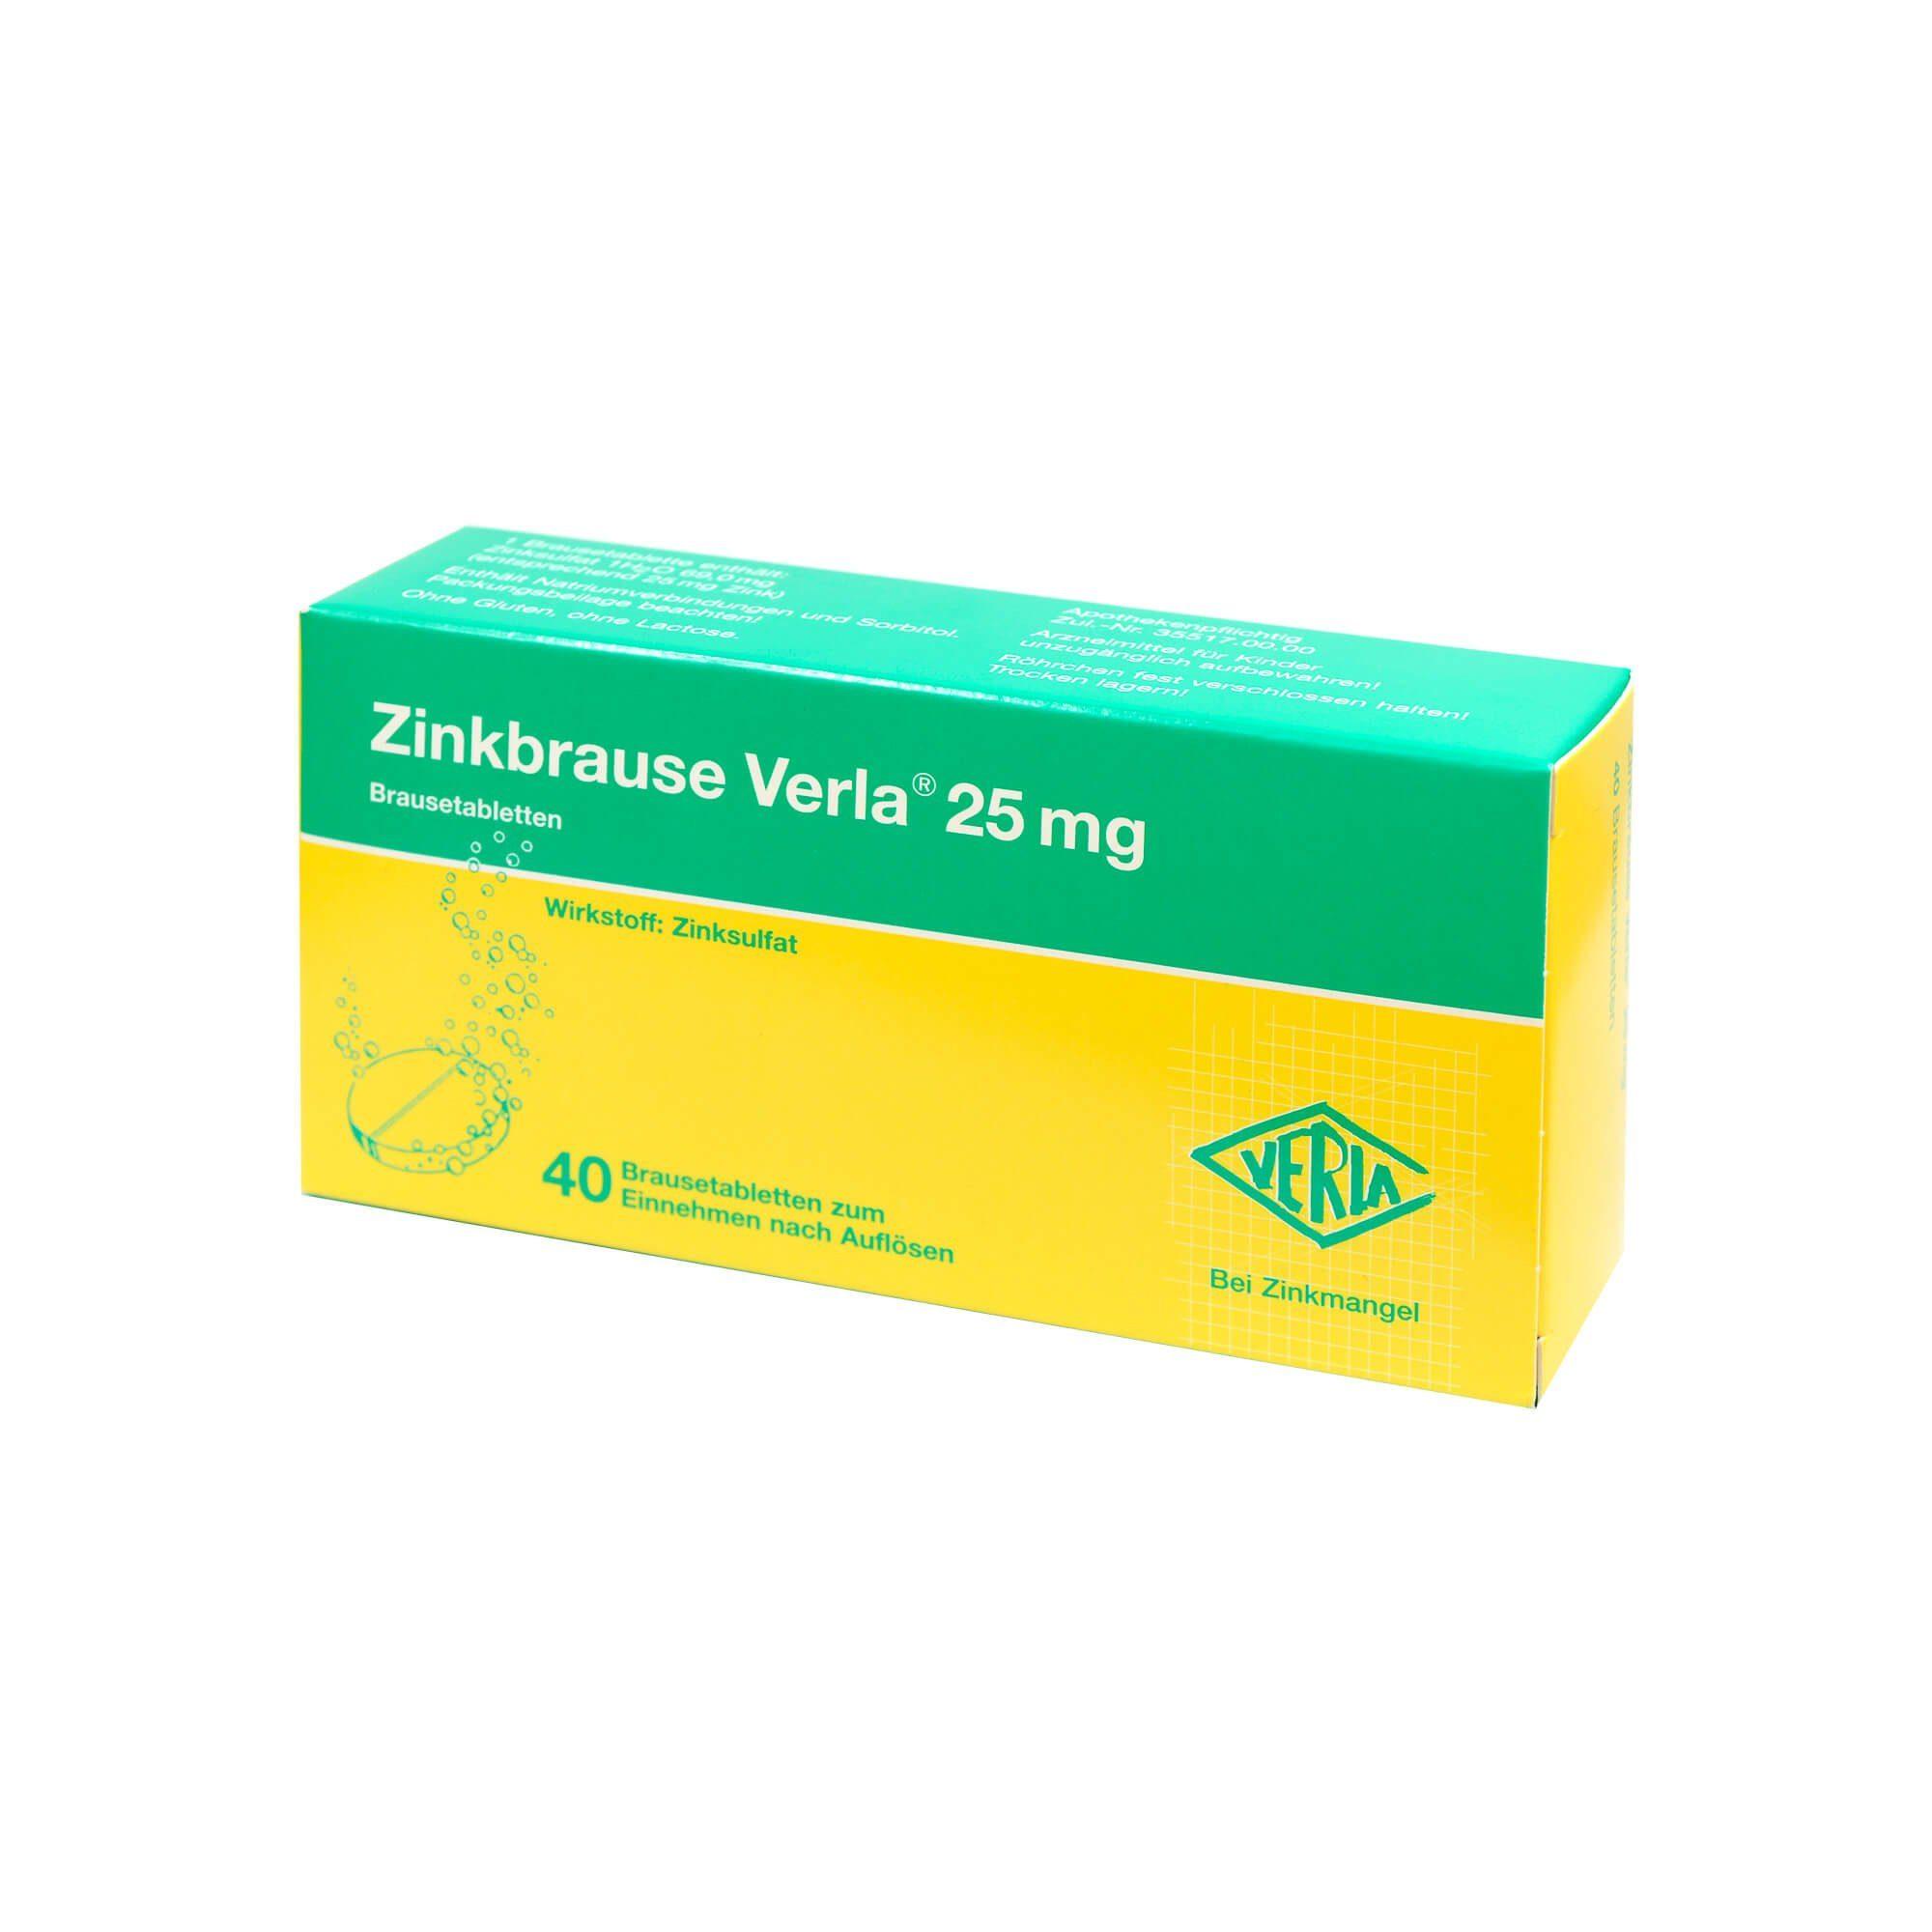 Zinkbrause Verla 25 mg, 100 St